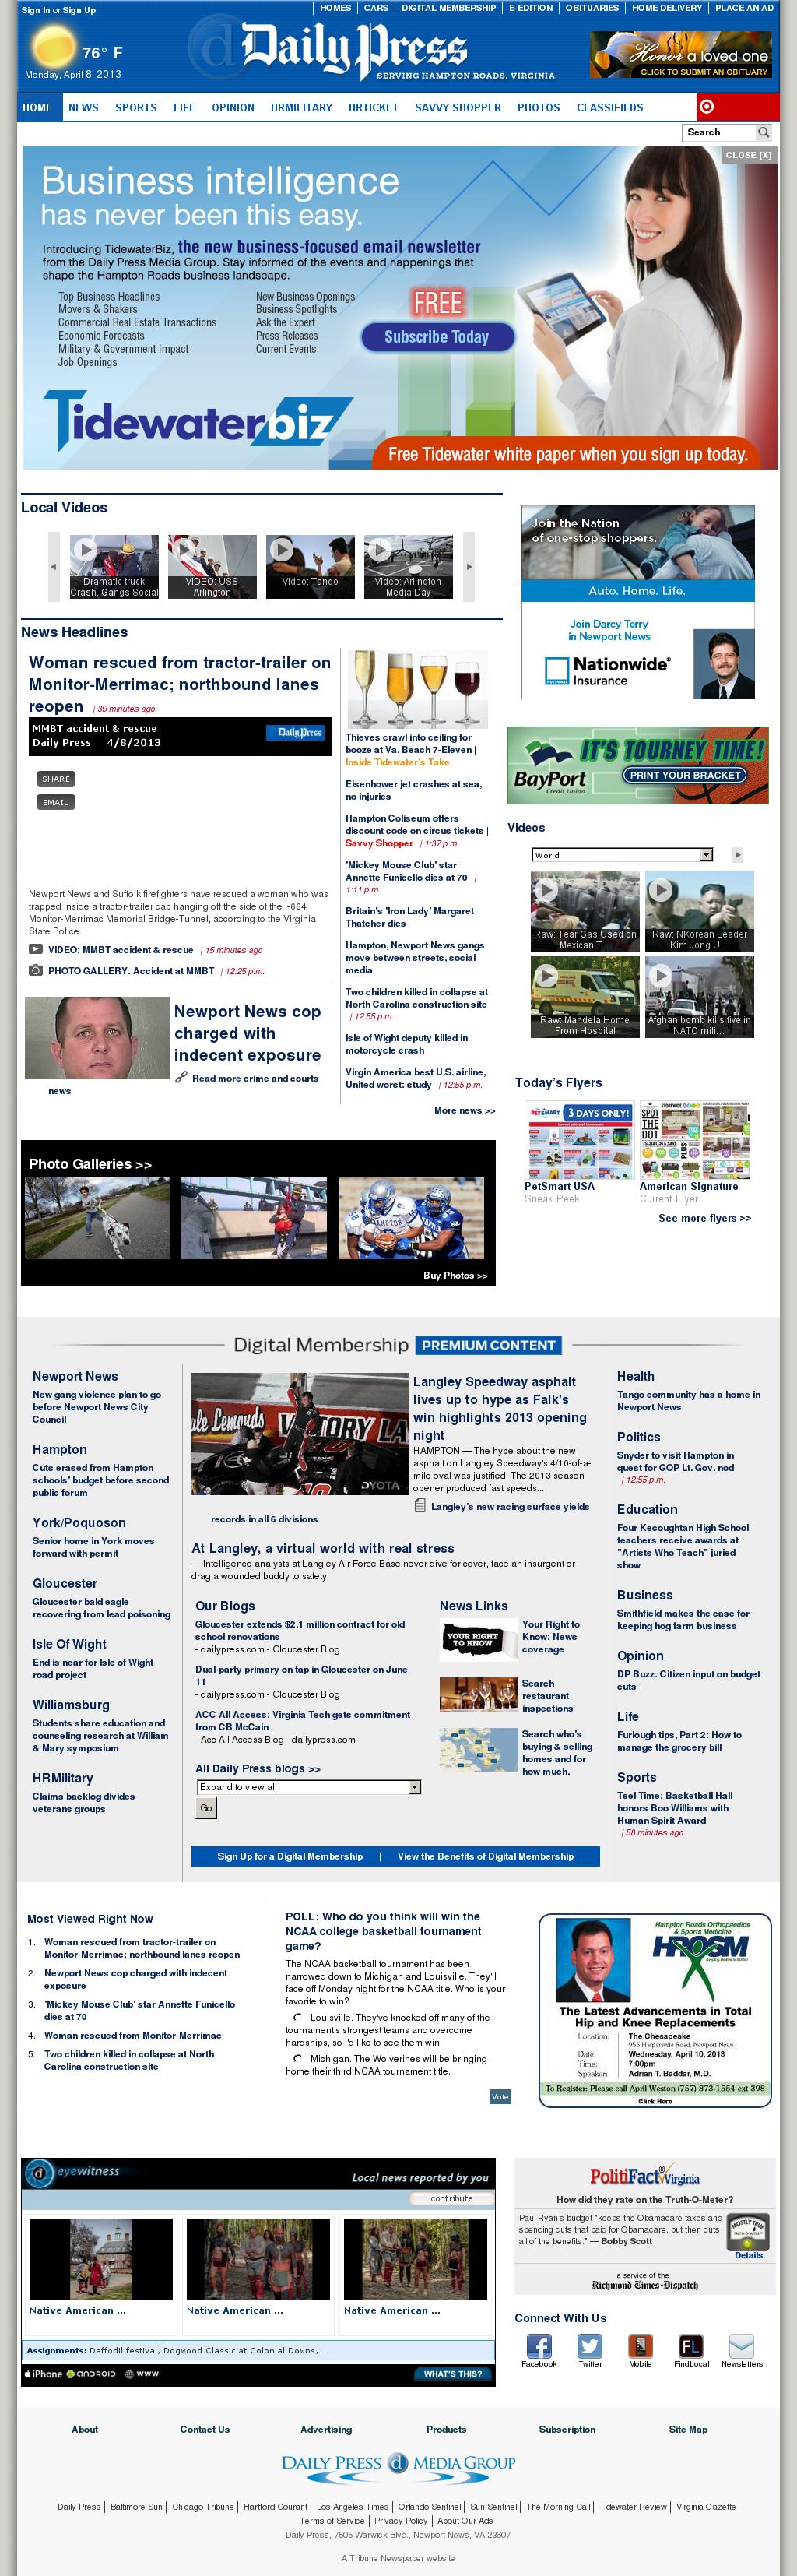 (Hampton Roads) Daily Press at Monday April 8, 2013, 7:04 p.m. UTC